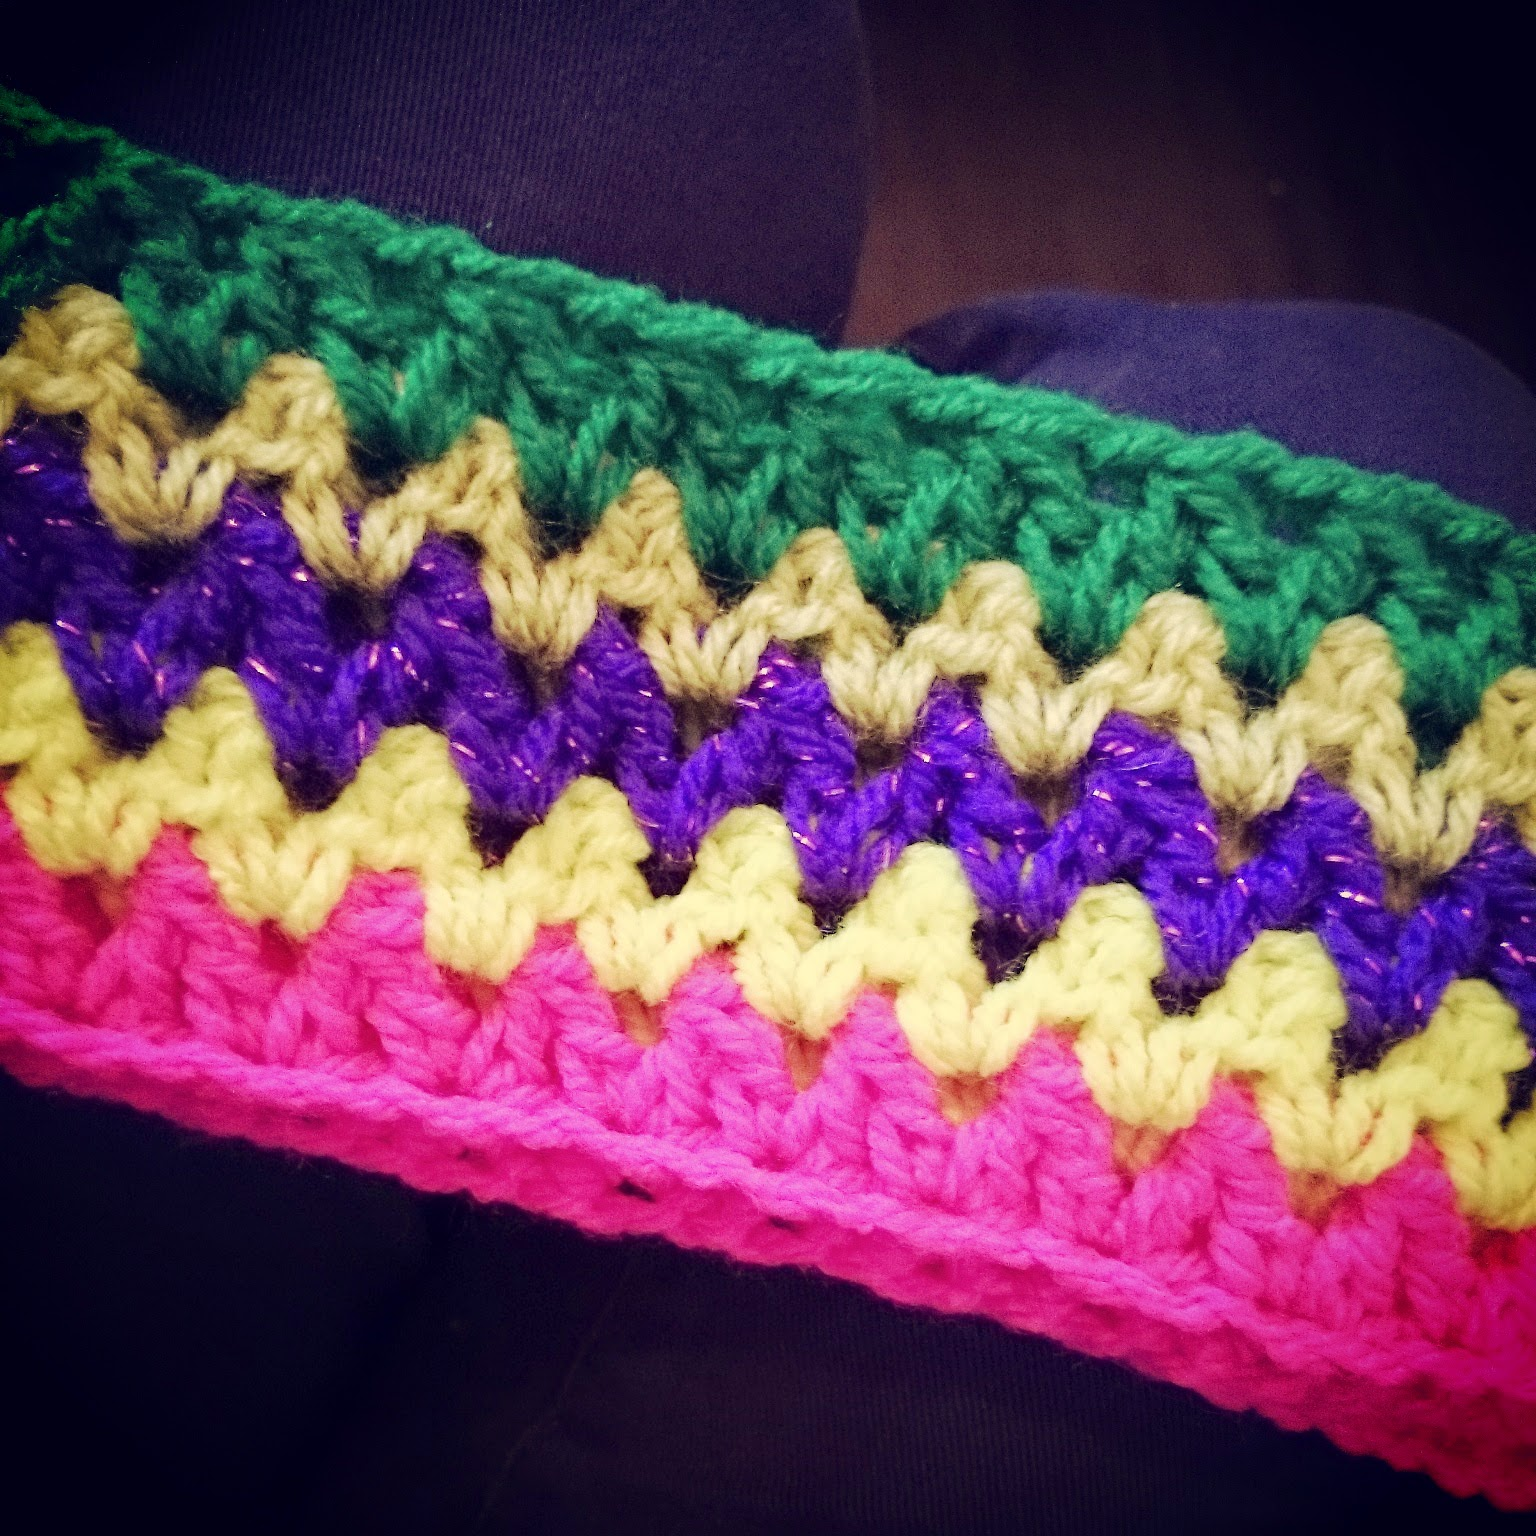 v stitch crochet travel blanket double crochet together method hook yarn wool bright vintage